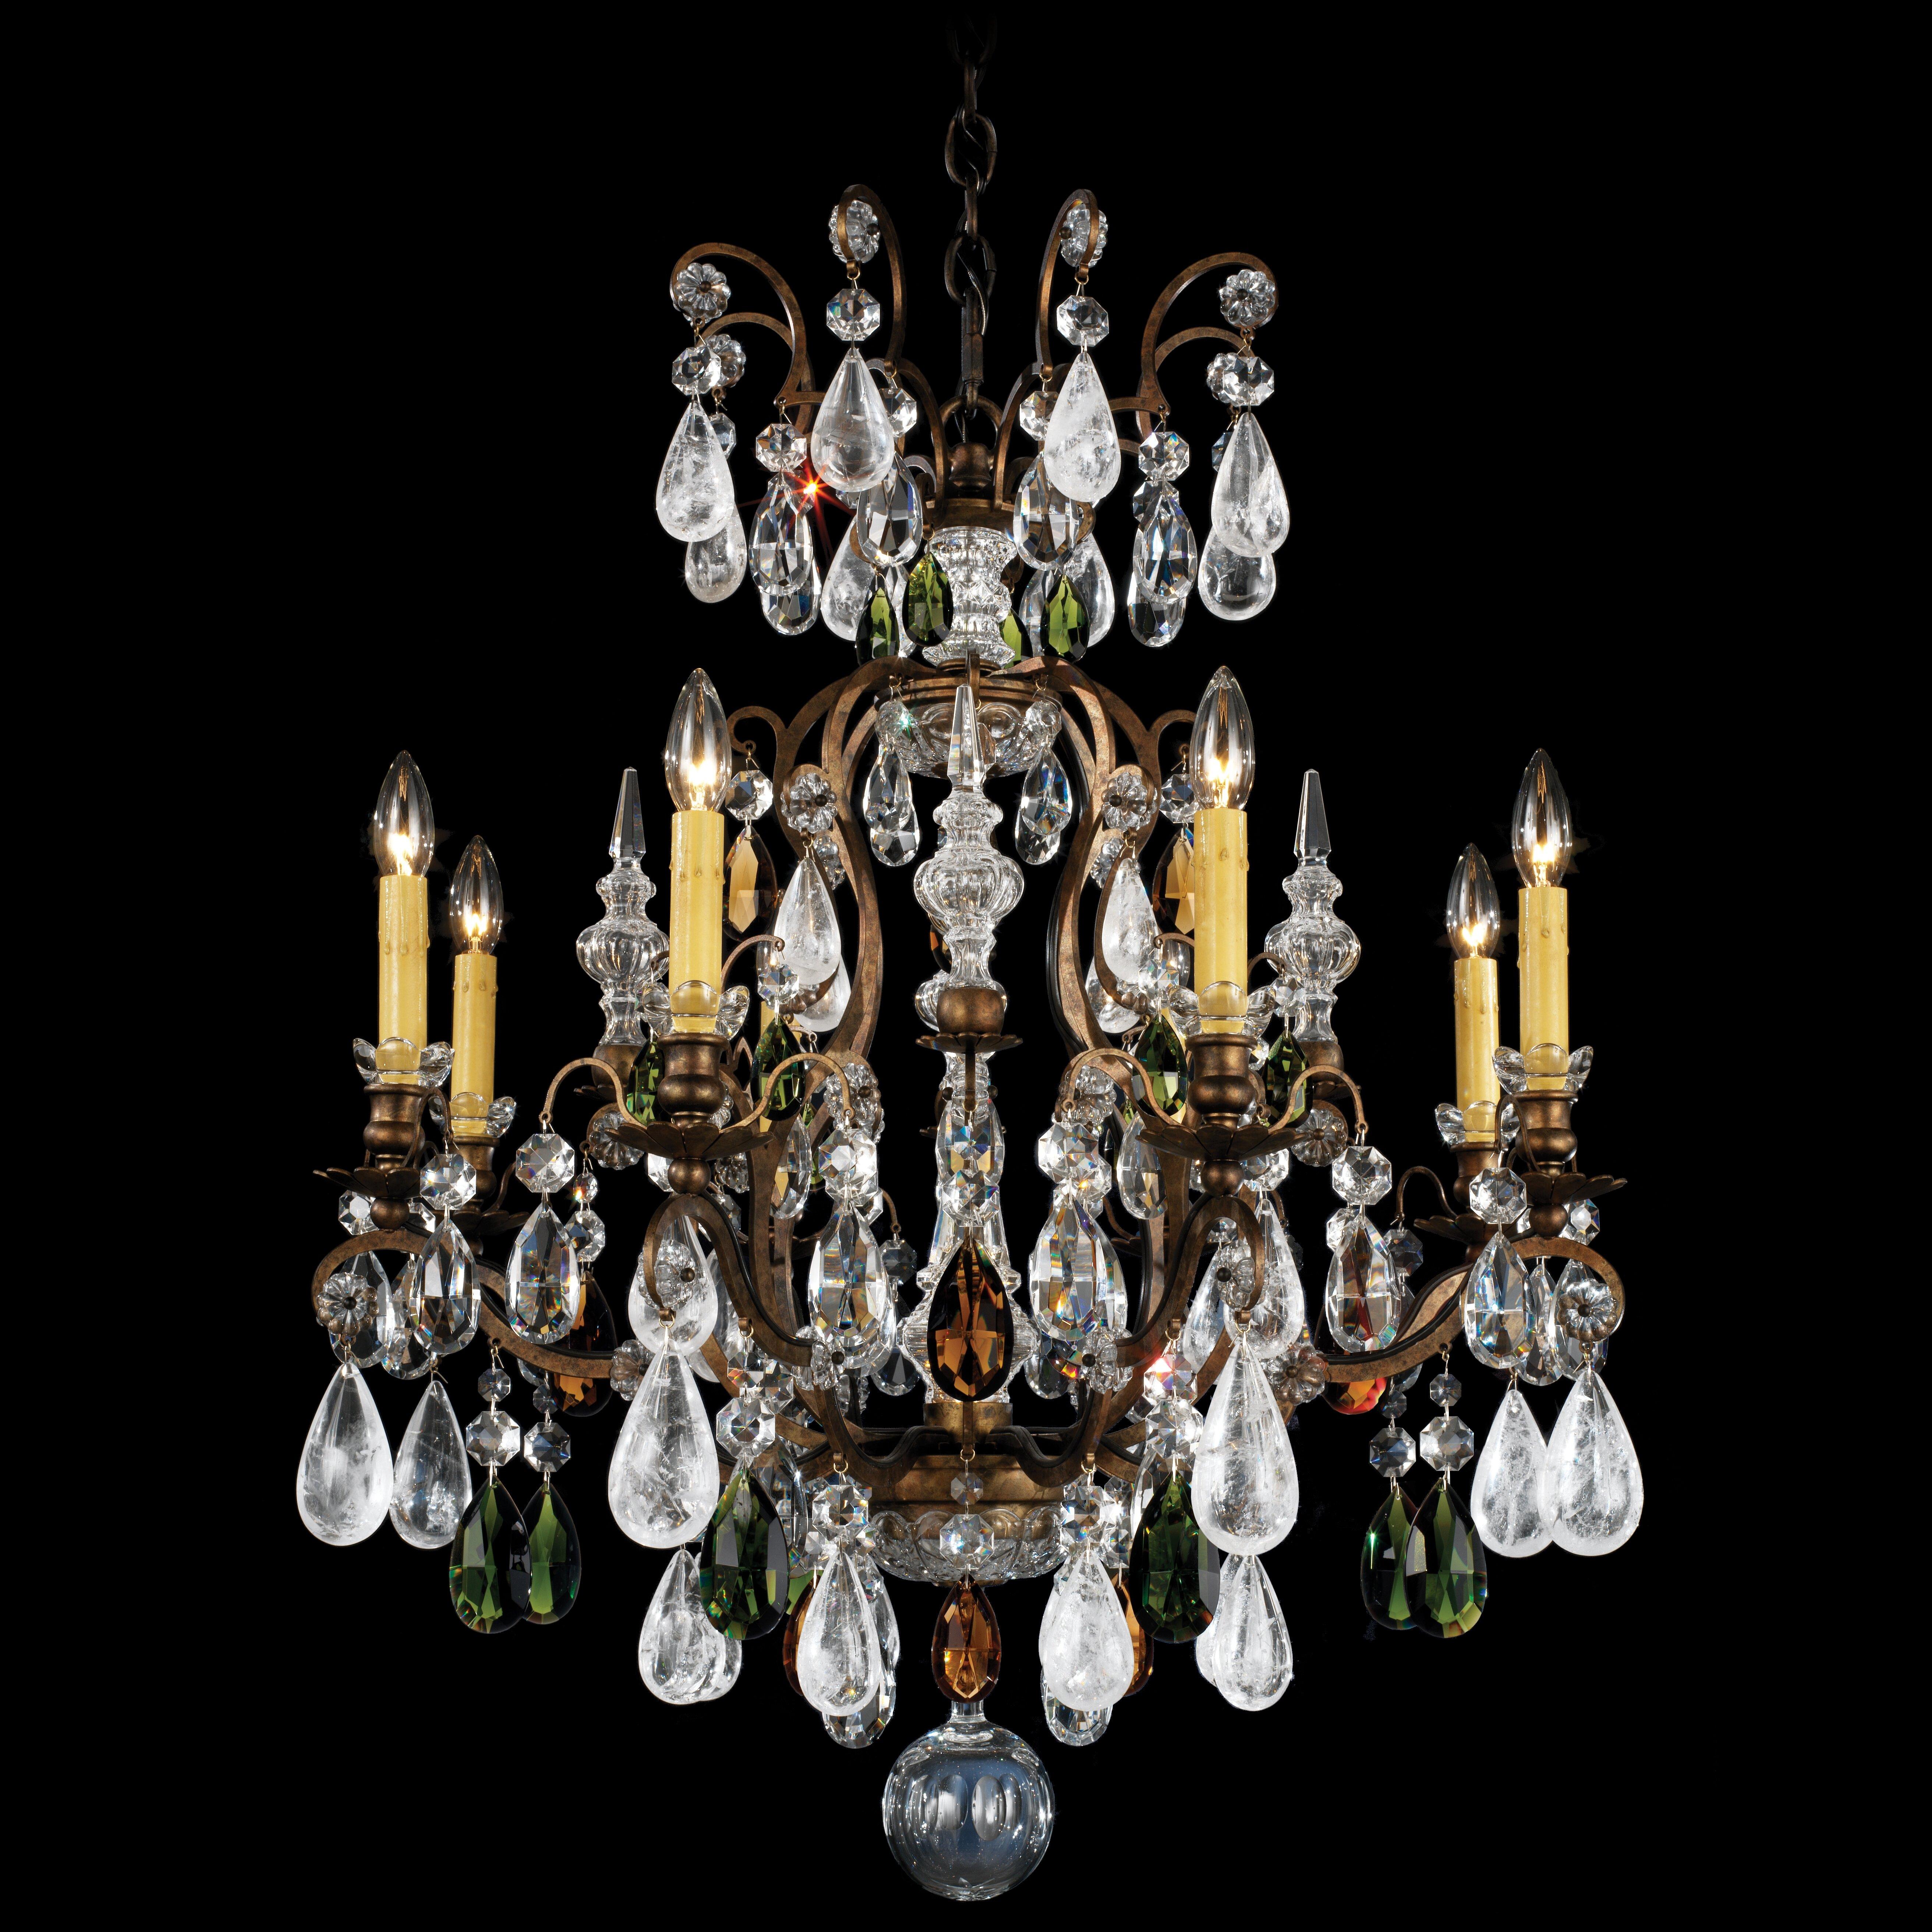 Schonbek Chandelier Wayfair: Schonbek Renaissance Rock 8-Light Crystal Chandelier